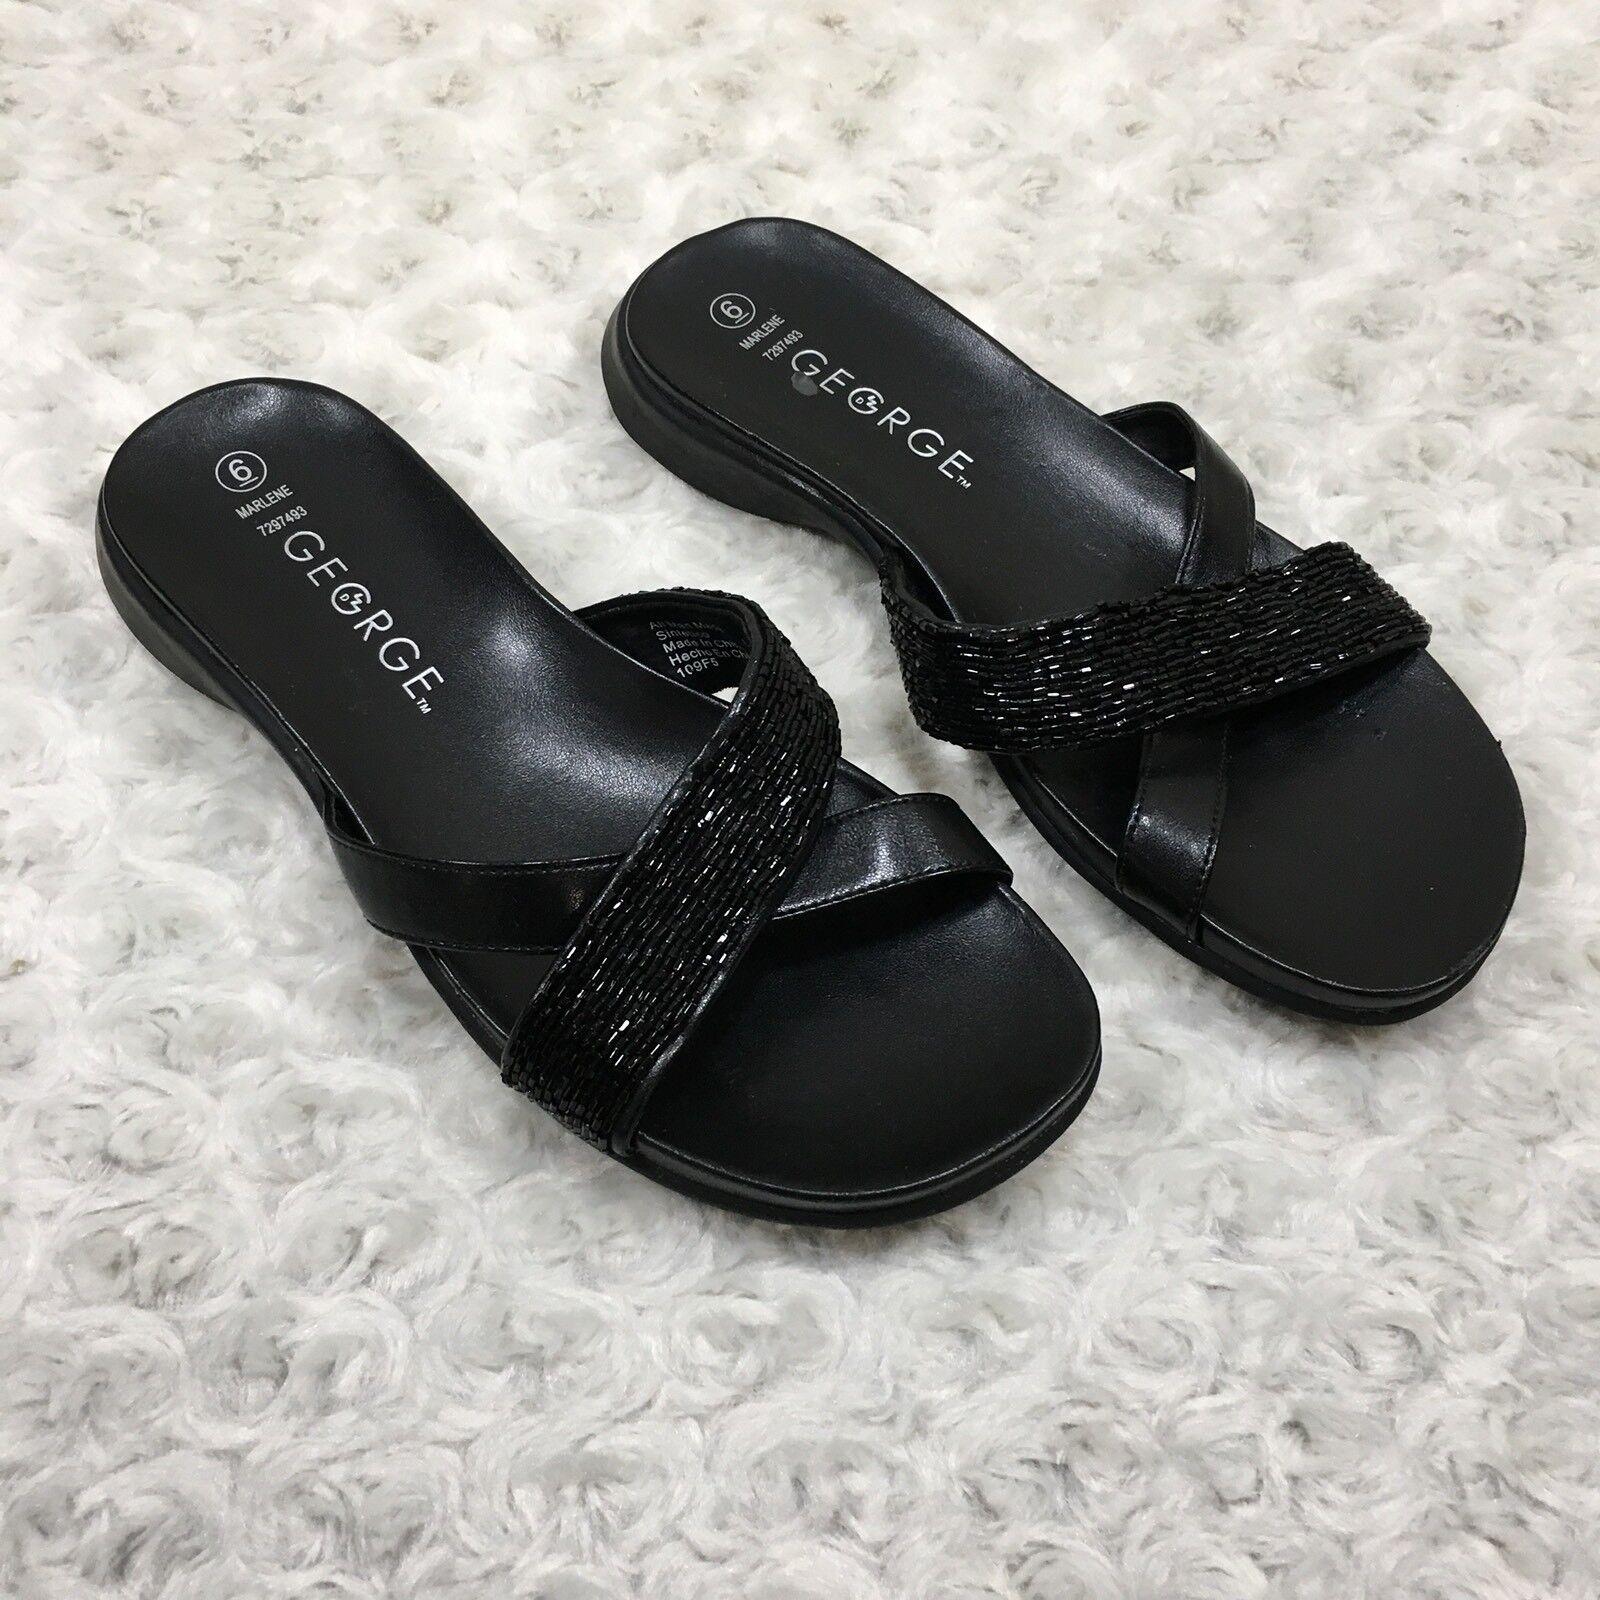 George Womens Marlene Sandals On Size 6 Black Slip On Sandals Open Toe Beaded Strap LQ5254 42d807